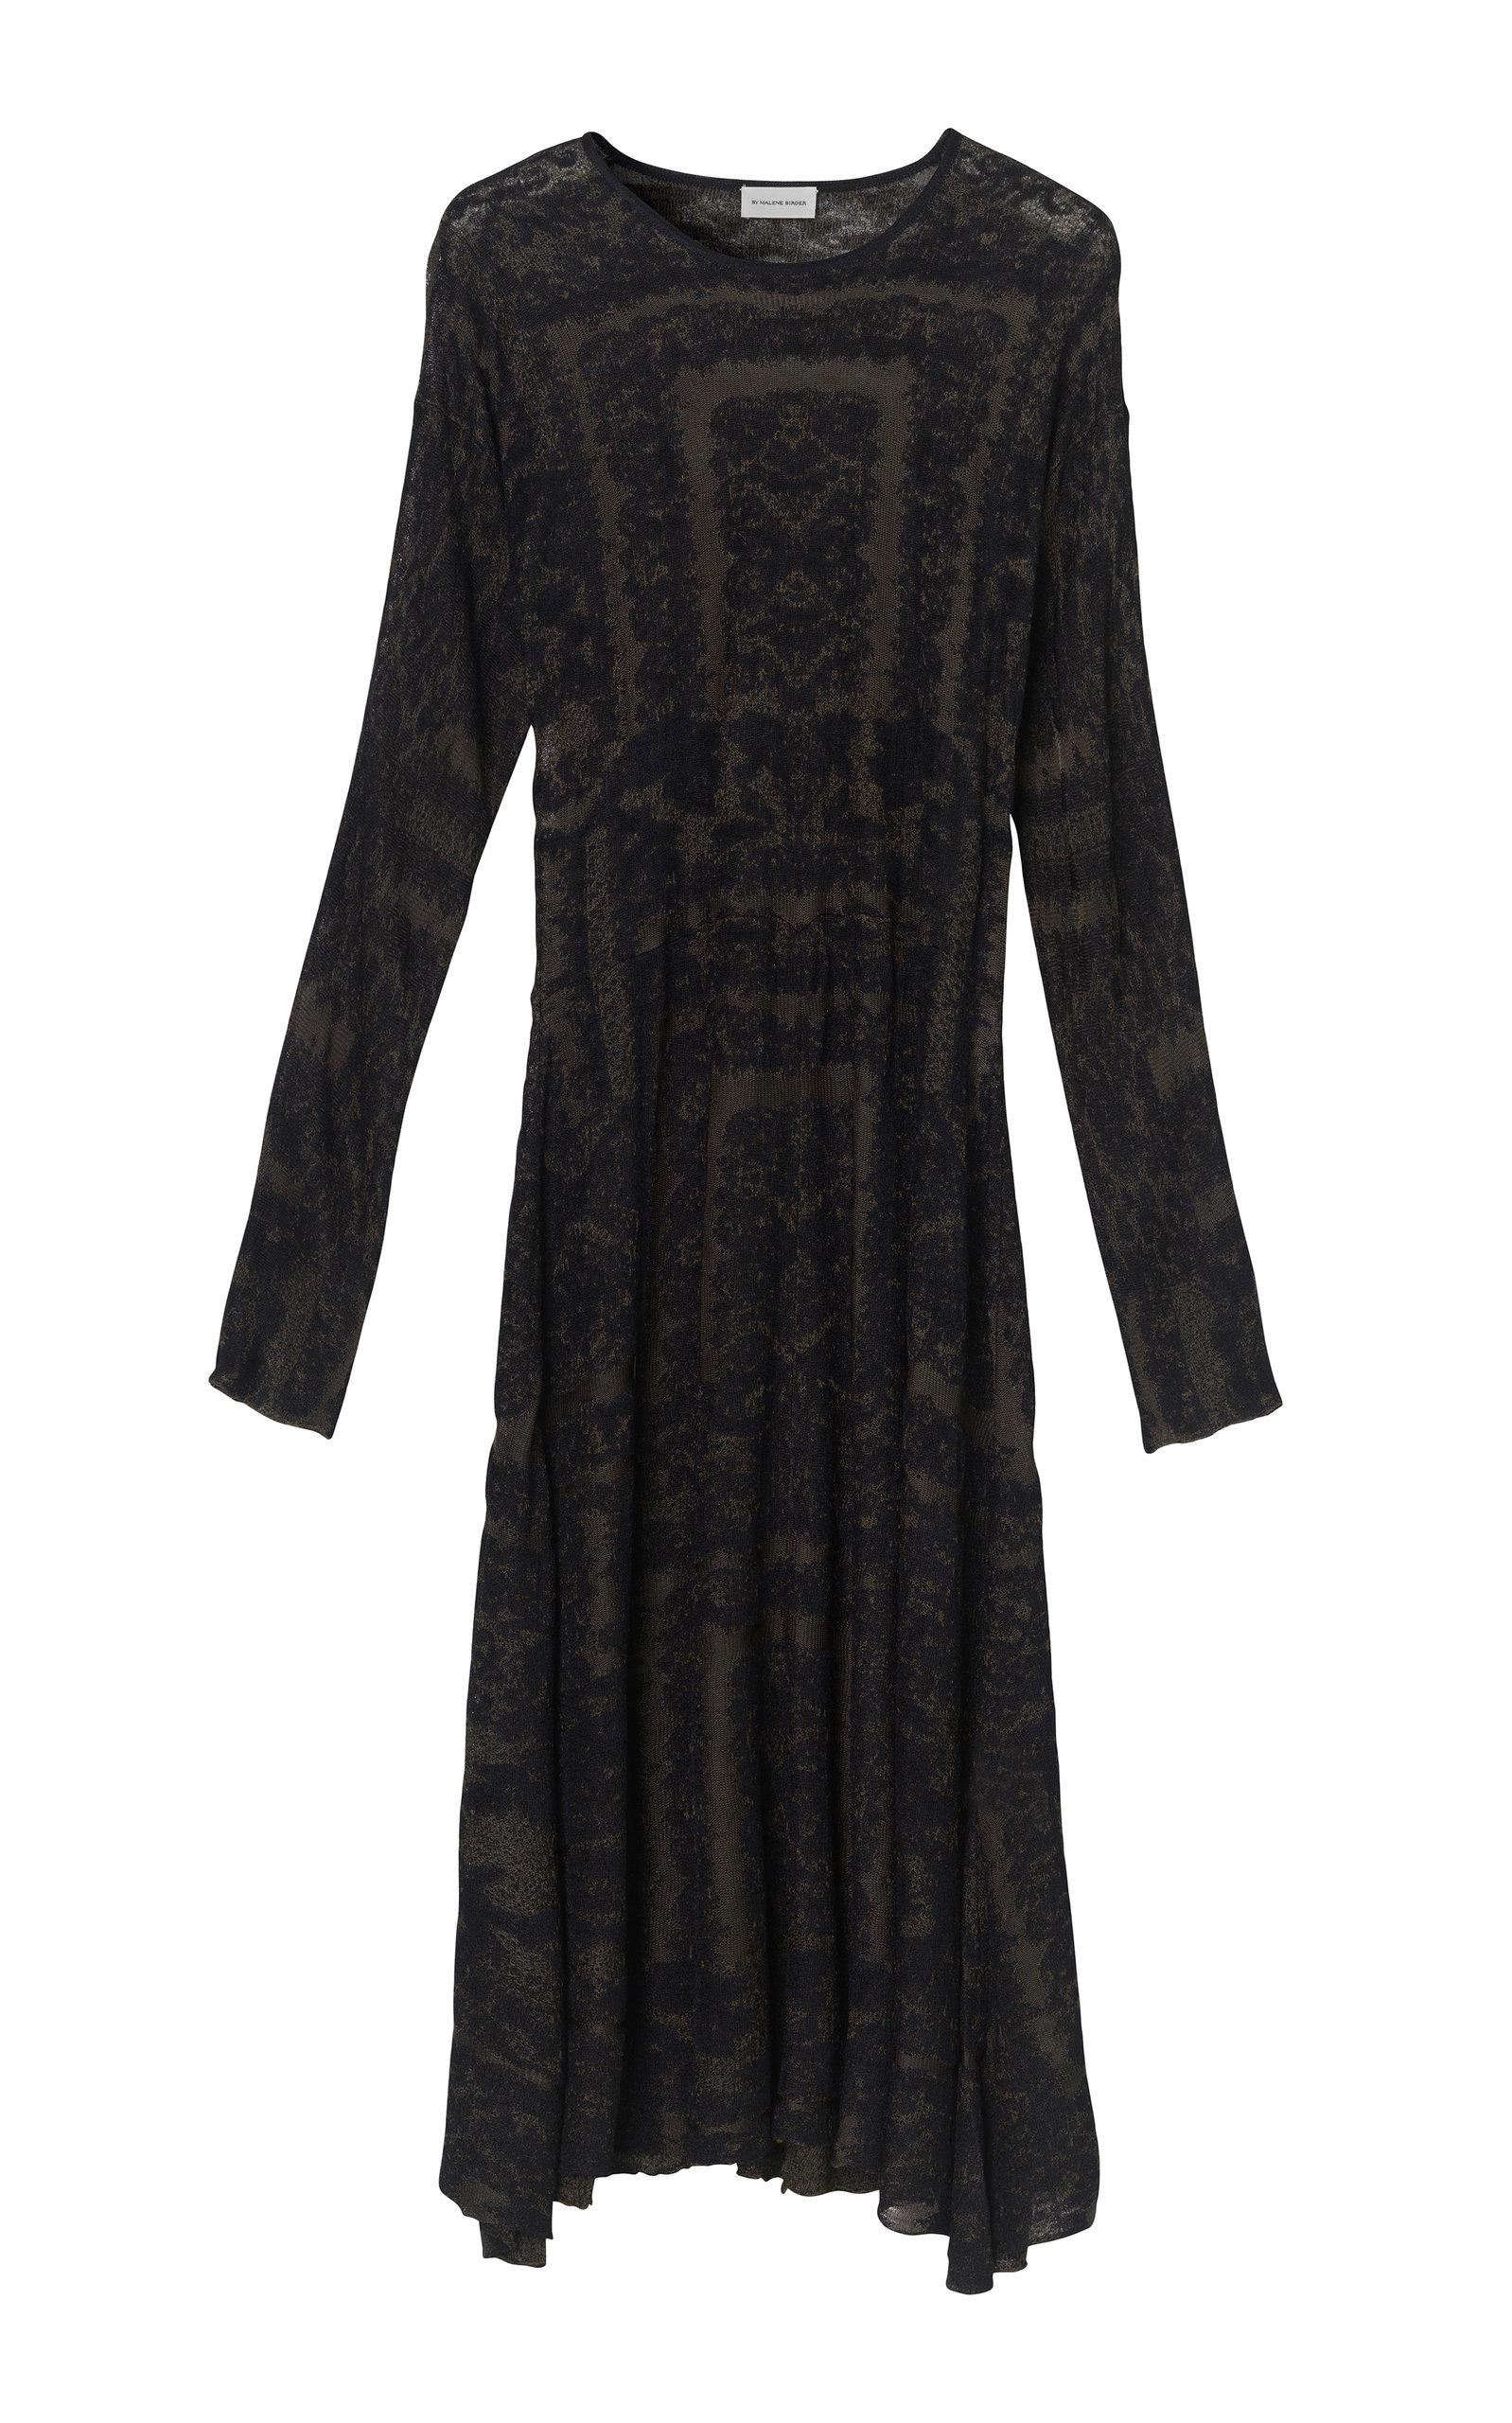 Buy By Malene Birger Onix Viscose Jacquard Dress online, shop By Malene Birger at the best price